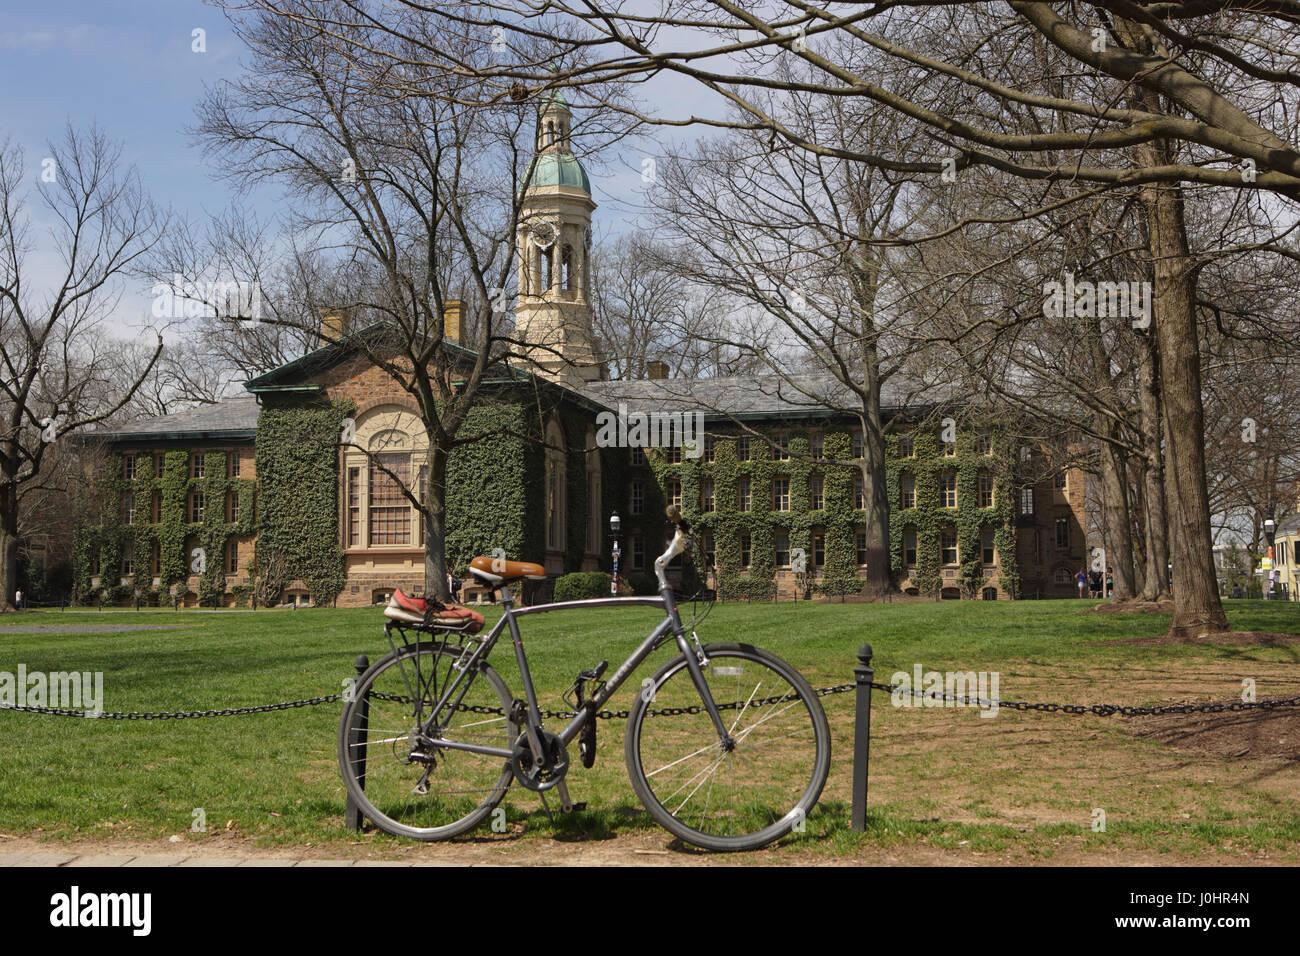 Princeton, NJ, USA - April 11, 2017: Princeton University Campus in spring. Nassau Hall and Cannon Green. Bicycle - Stock Image